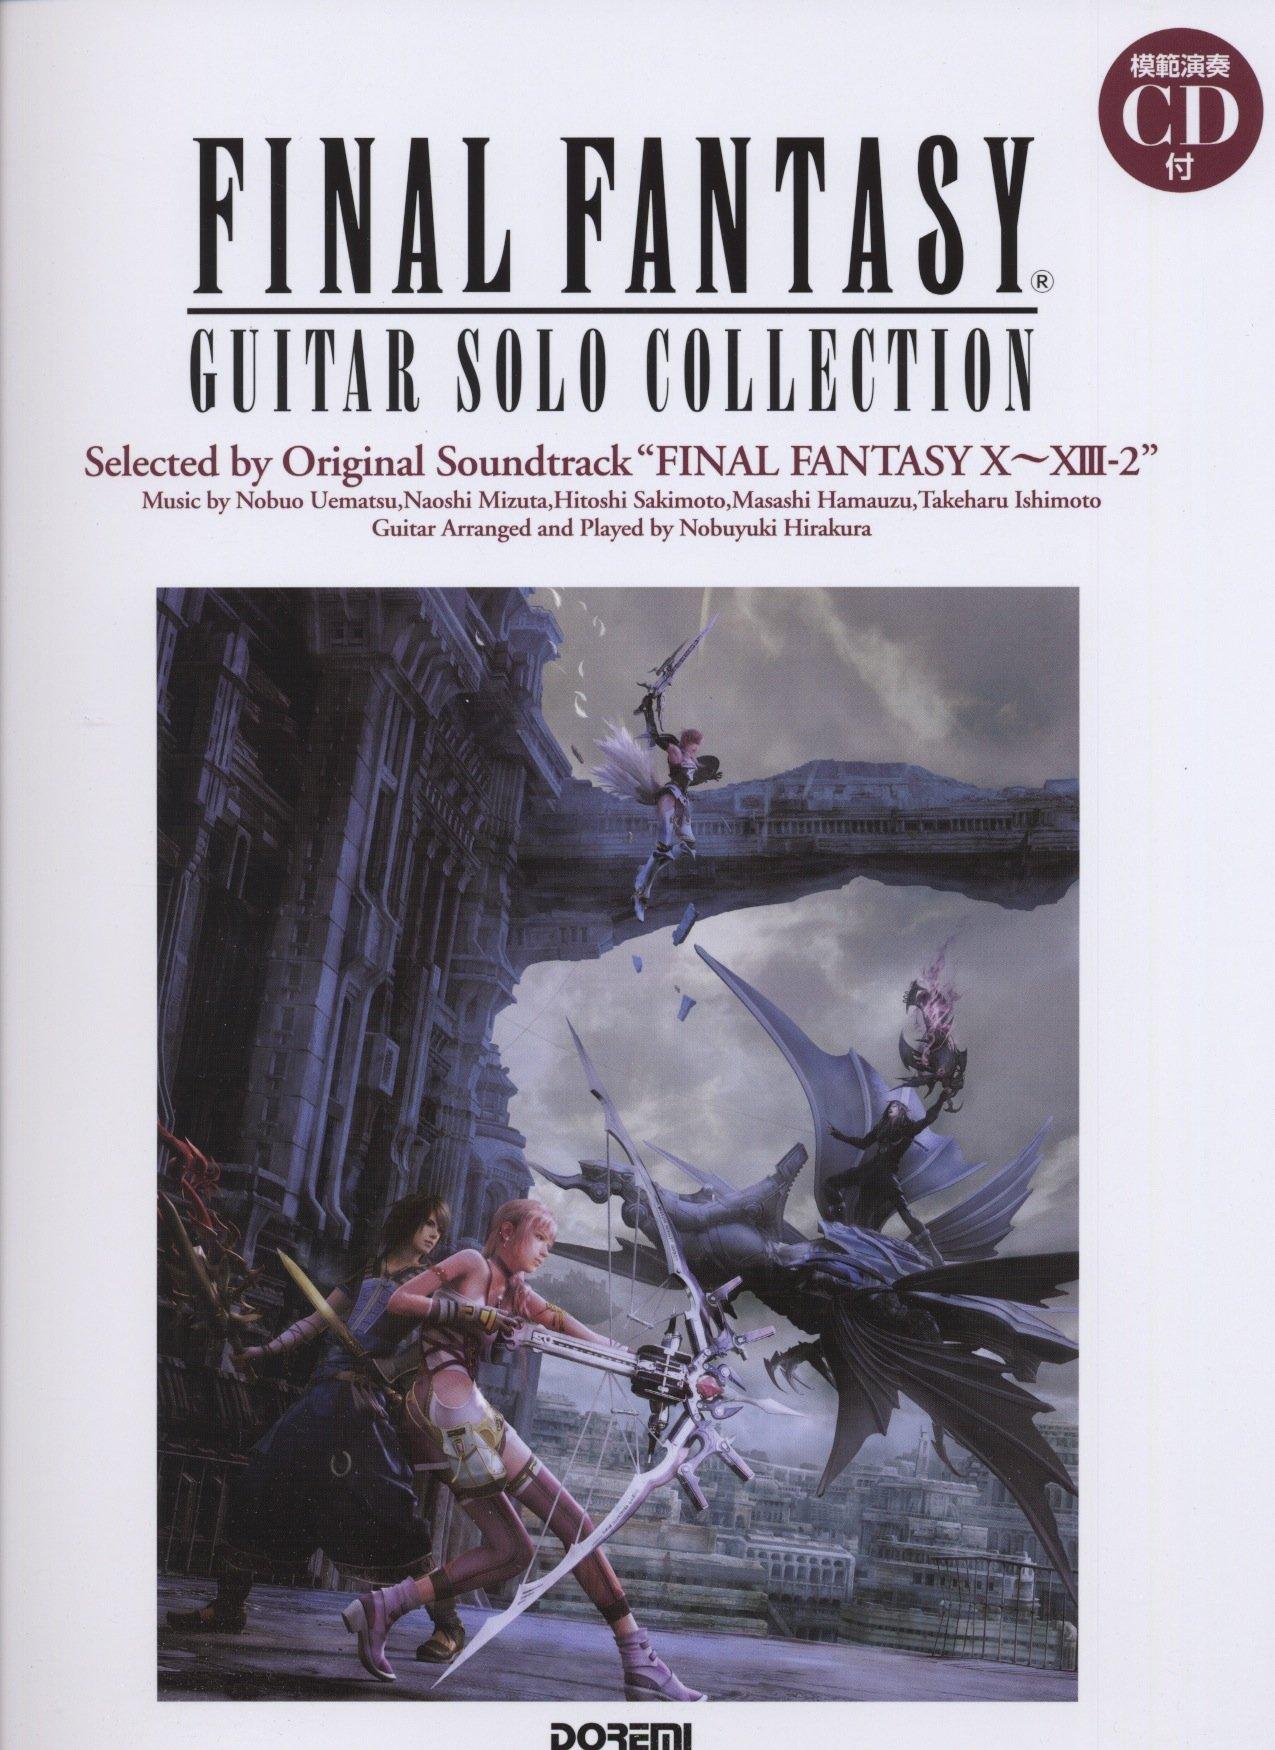 Final fantasy x: original soundtrack (cd, unofficial release.